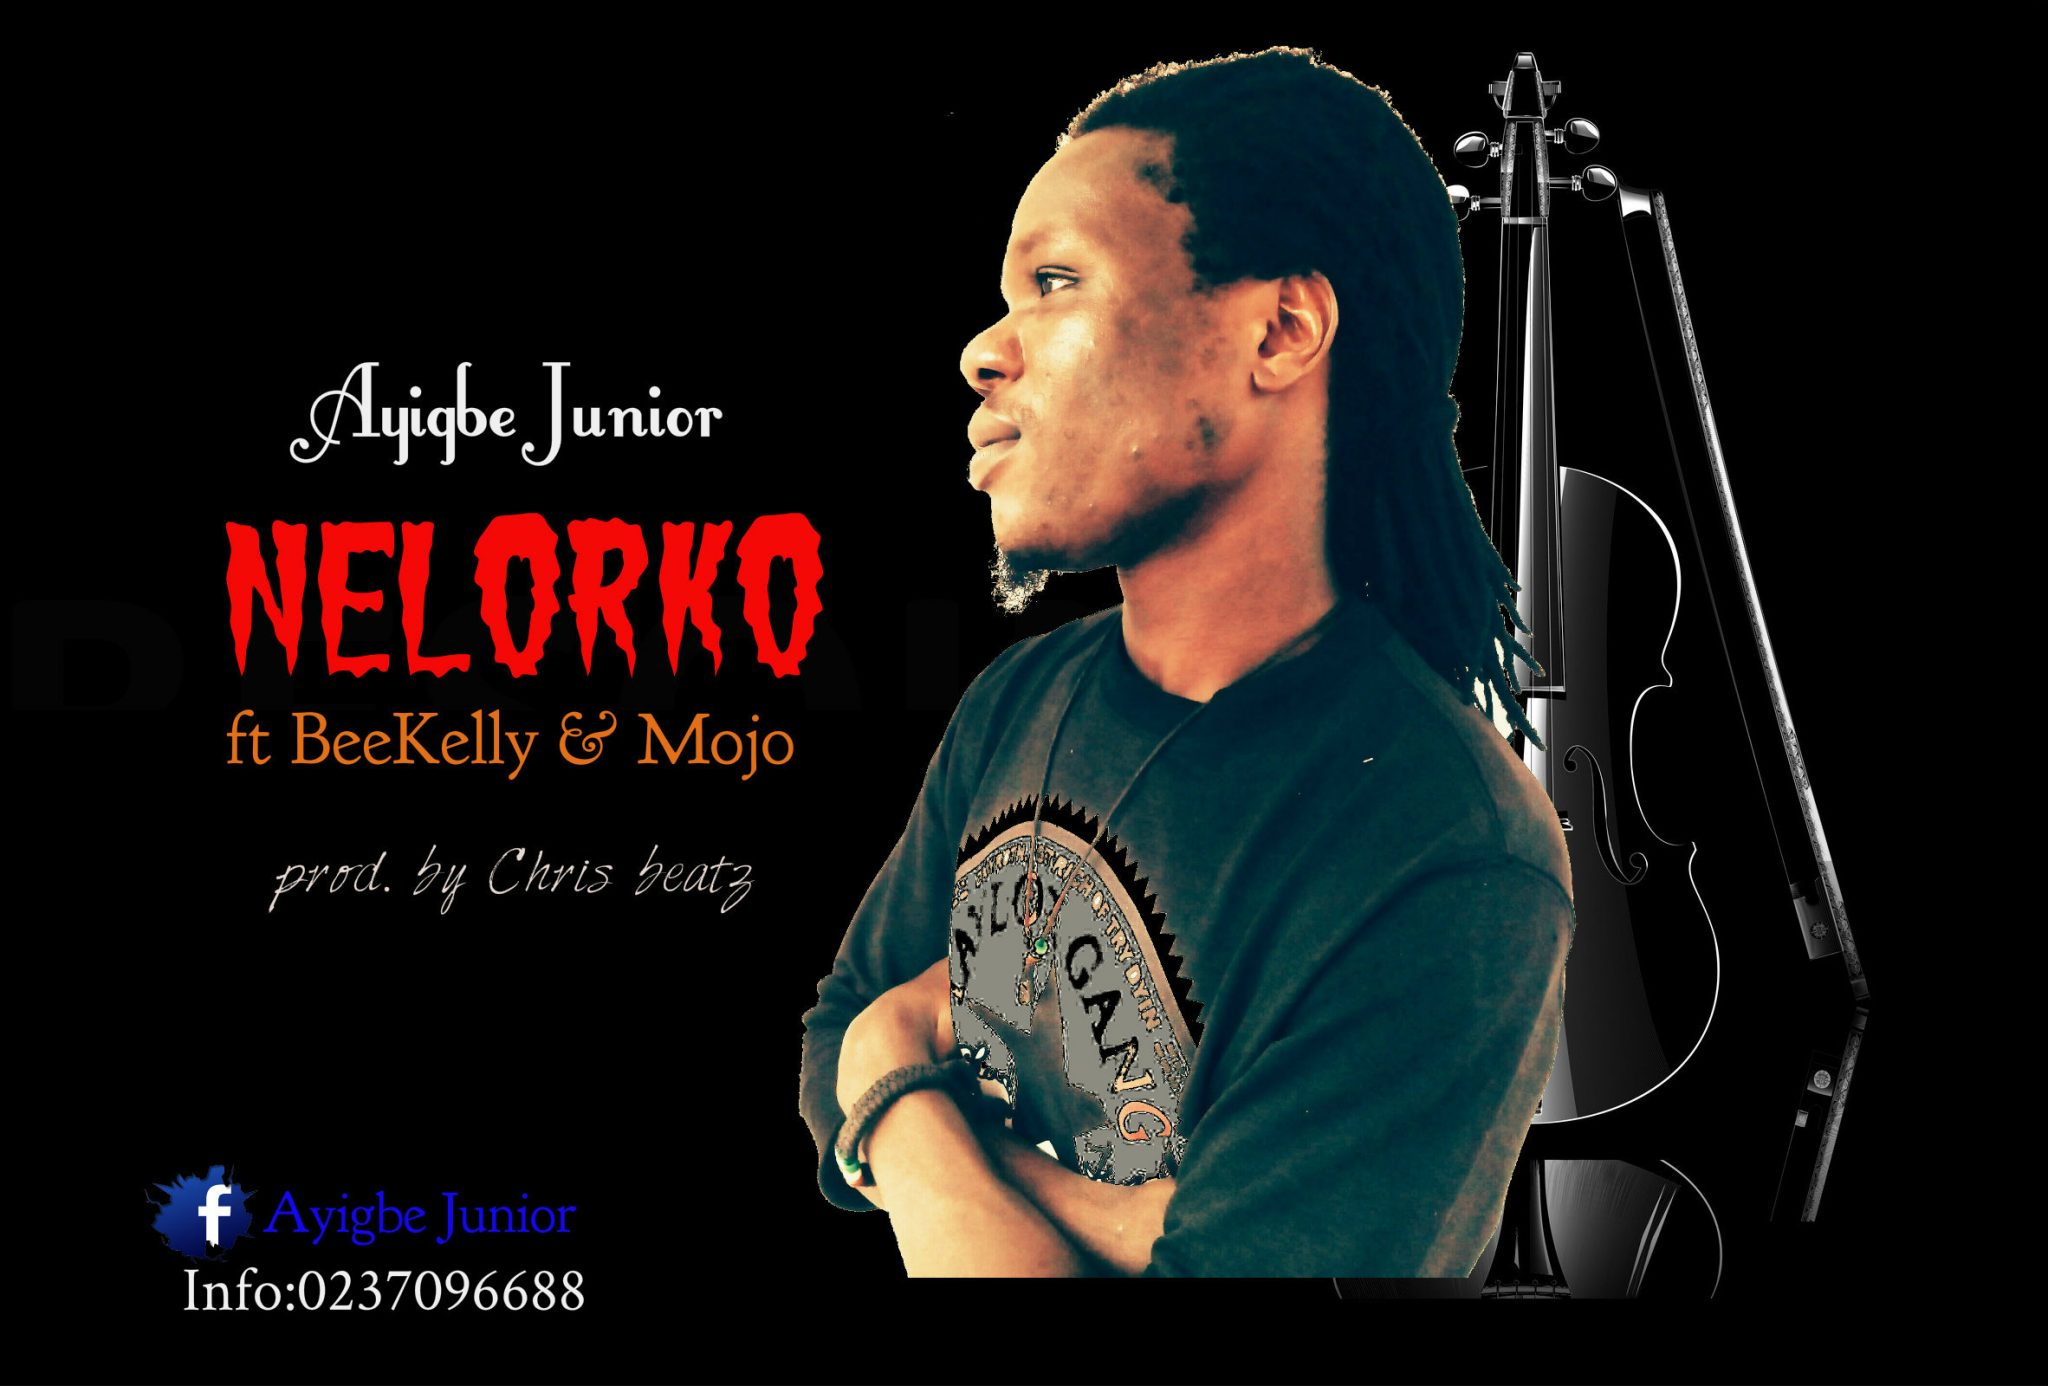 Ayigbe Junior Nolorko Ft Mojo Bee Kelly prod by Chrisbeatz